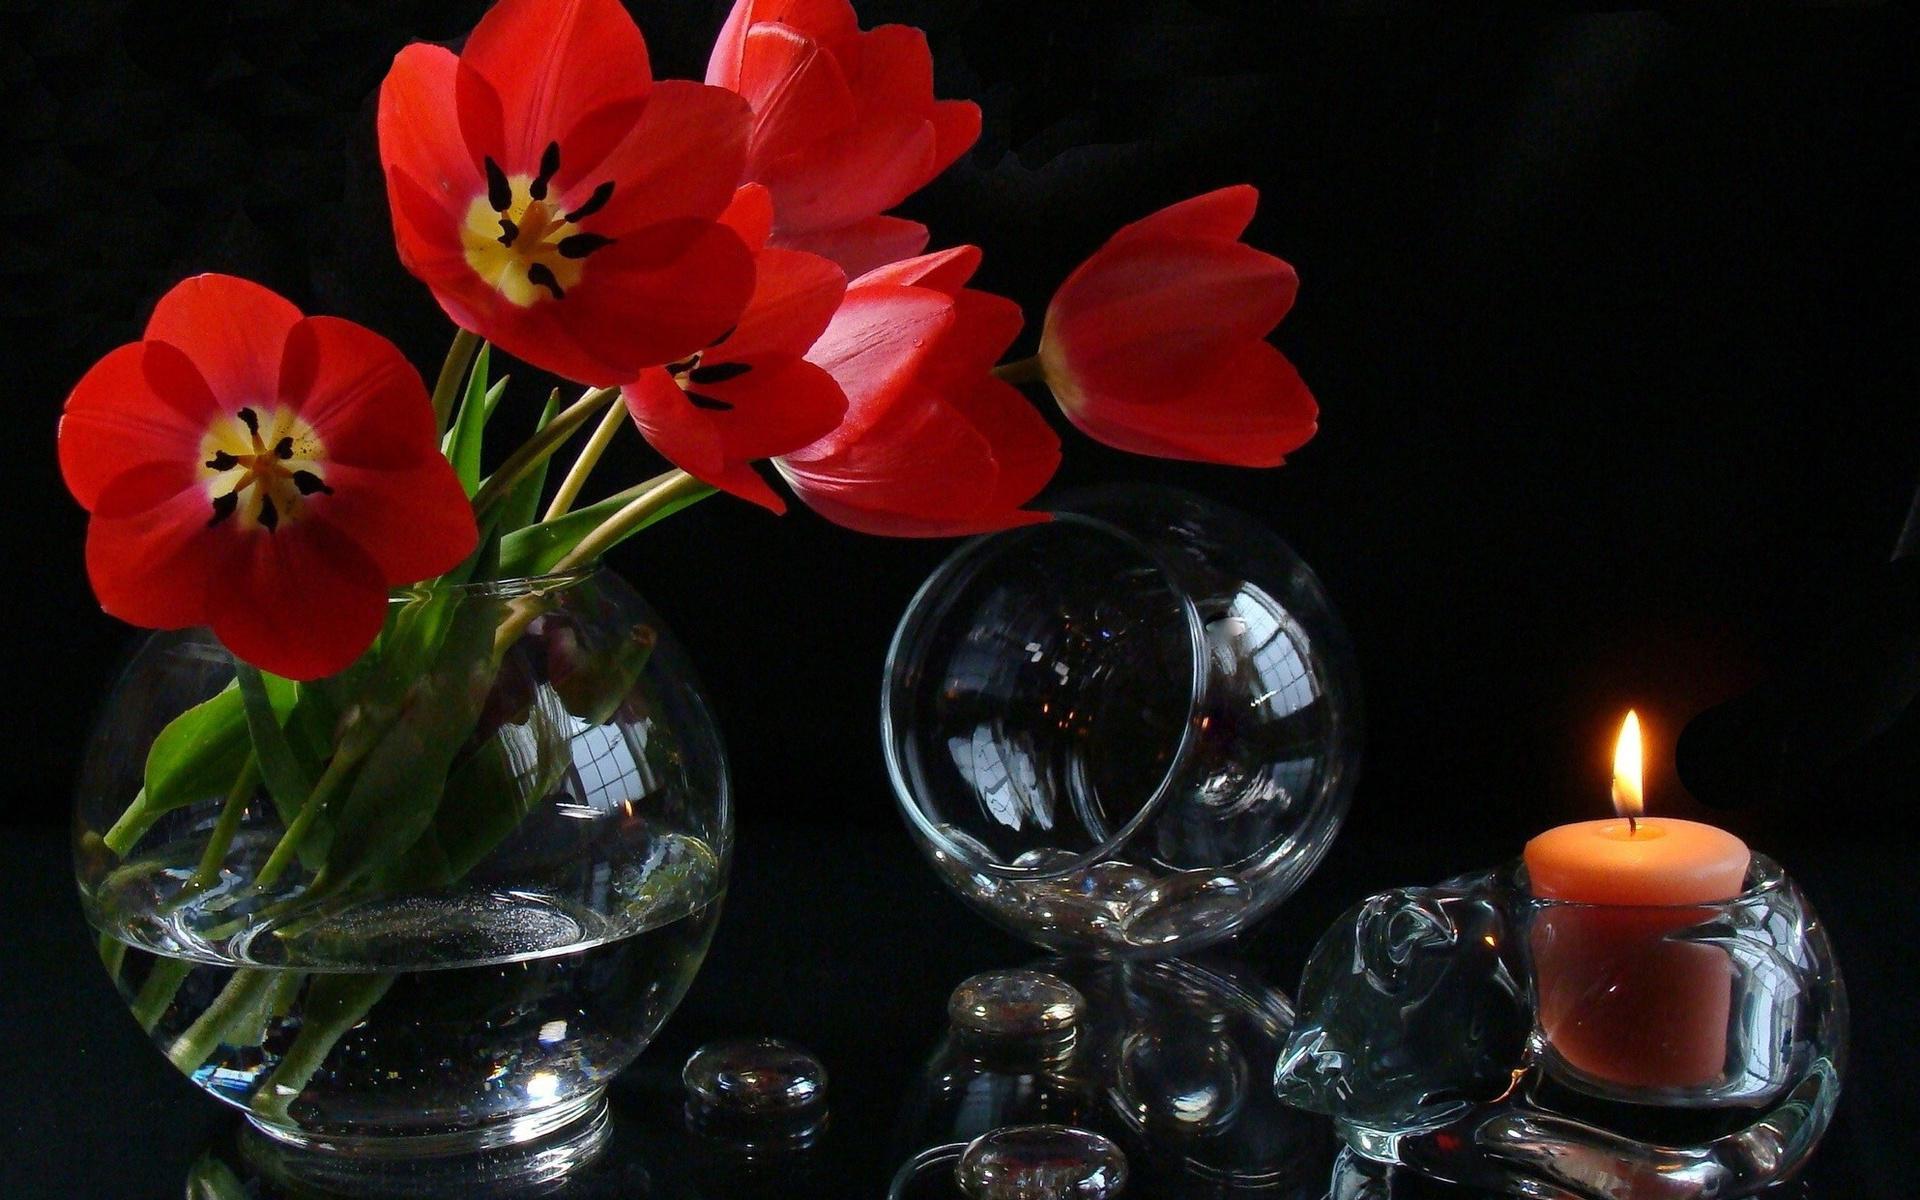 картинка свеча в вазе пространства